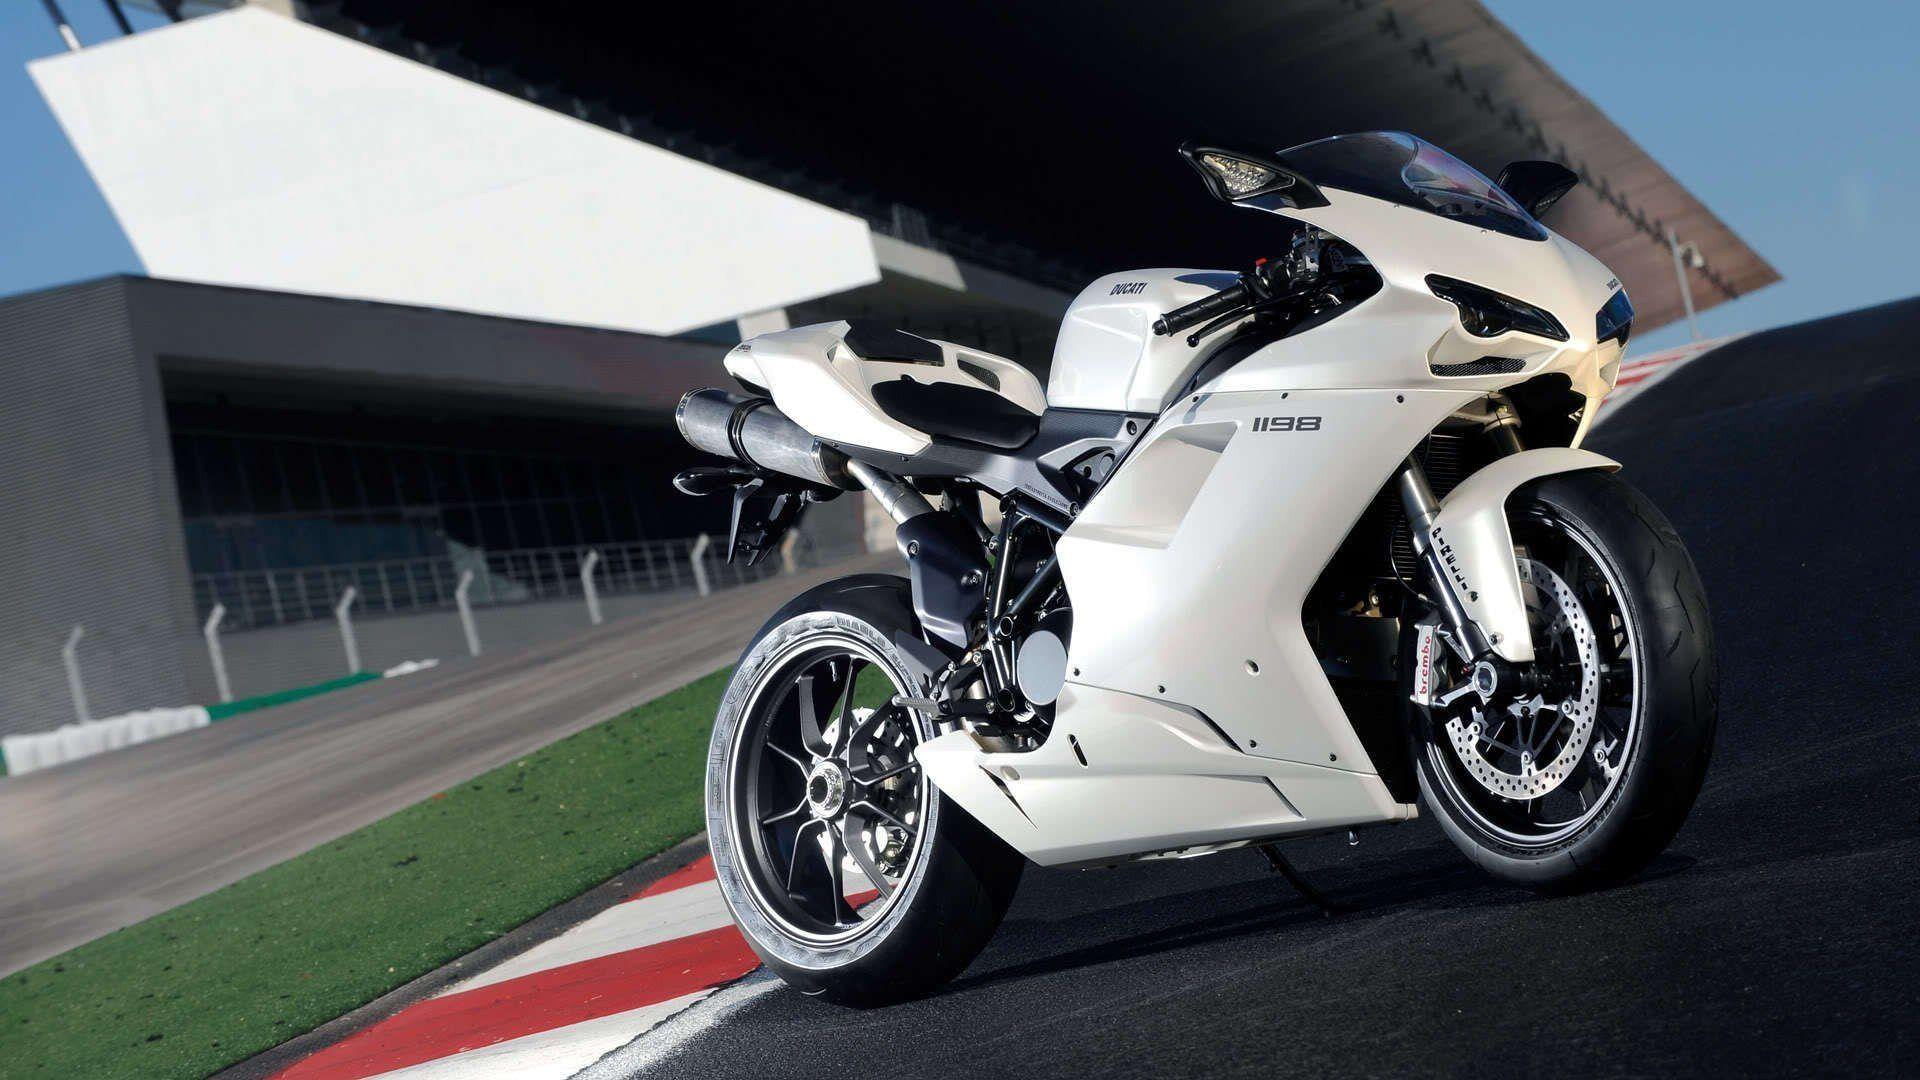 ukmoto import moto moto occasion moto anglaise moto angleterre 25 - ENQUETE SATISFACTION SUR L'ACHAT DE MOTO ANGLAISE UKMOTO IMPORT